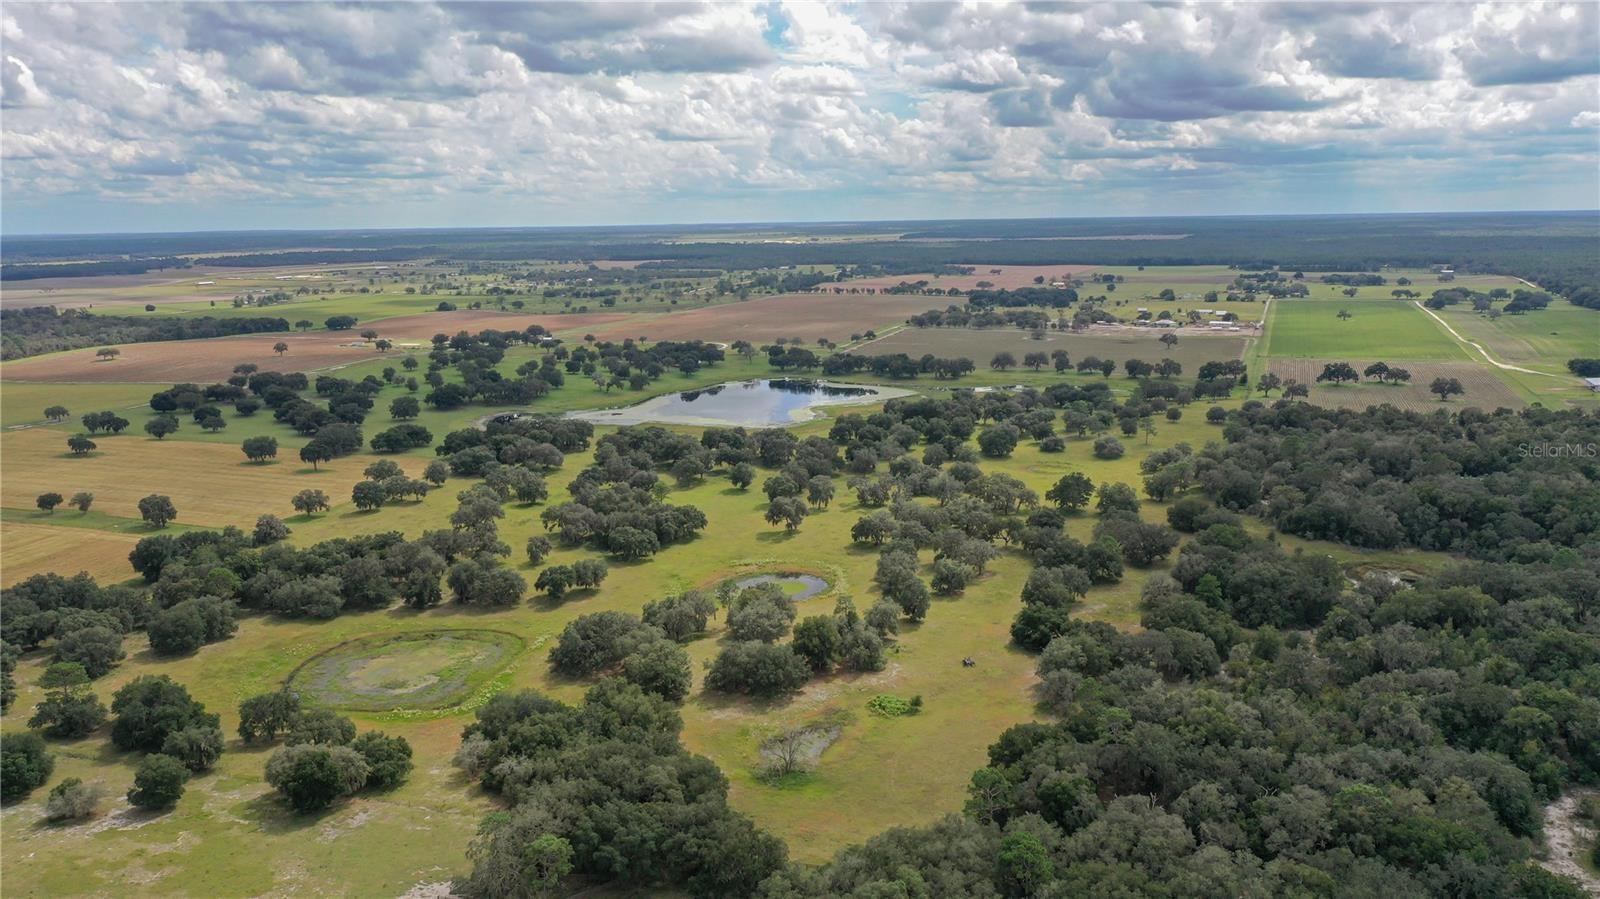 Stunning Florida Farm Land for Sale 76 Acres